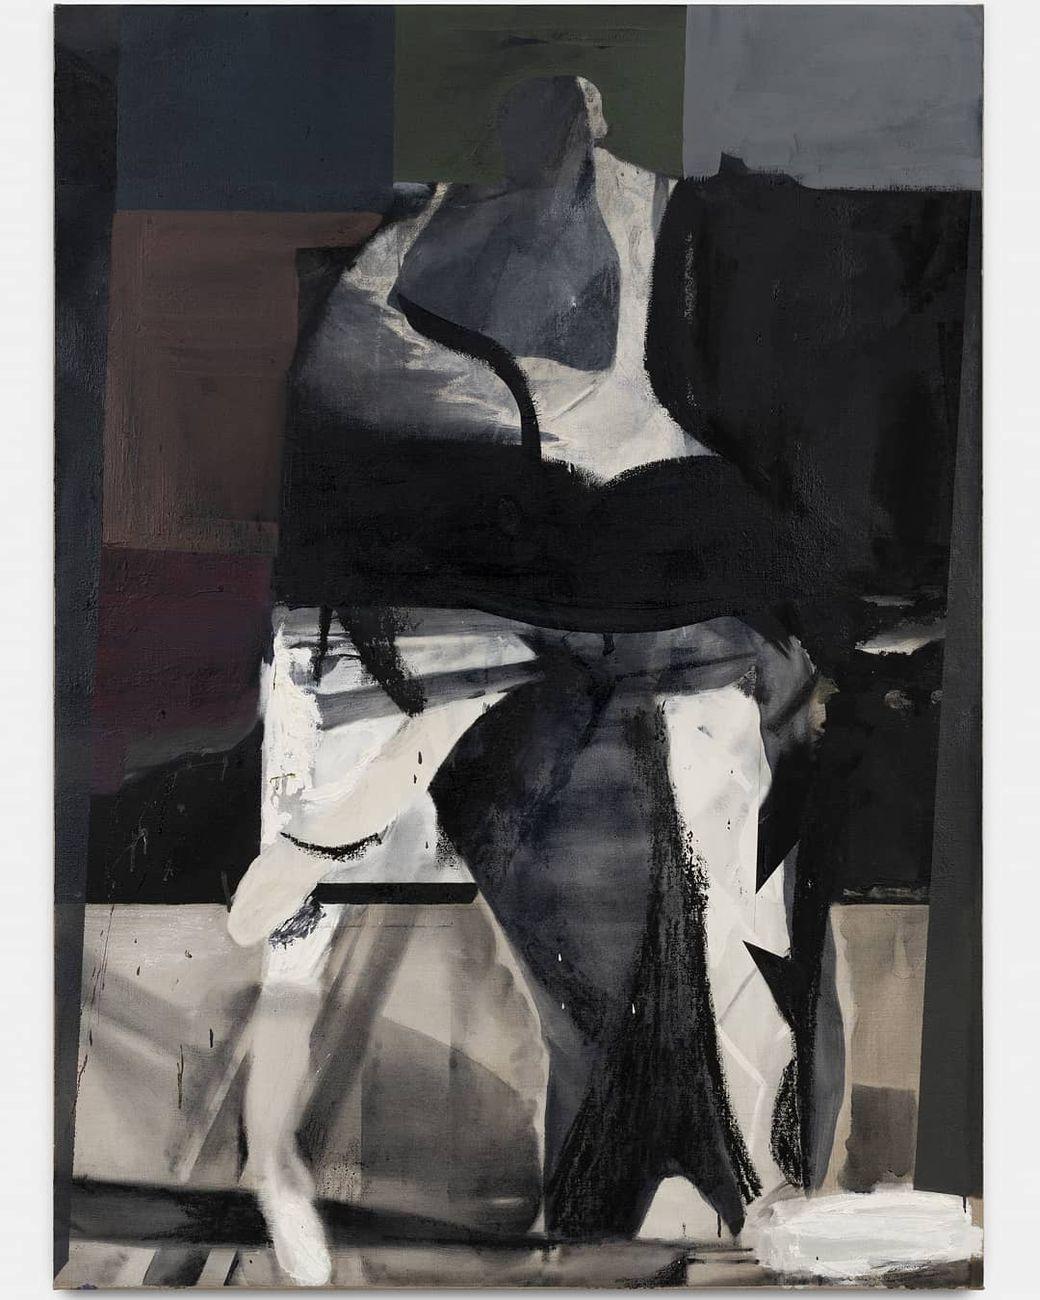 Alessandro Scarabello, Perseus, 2020, olio su tela, cm 170x123